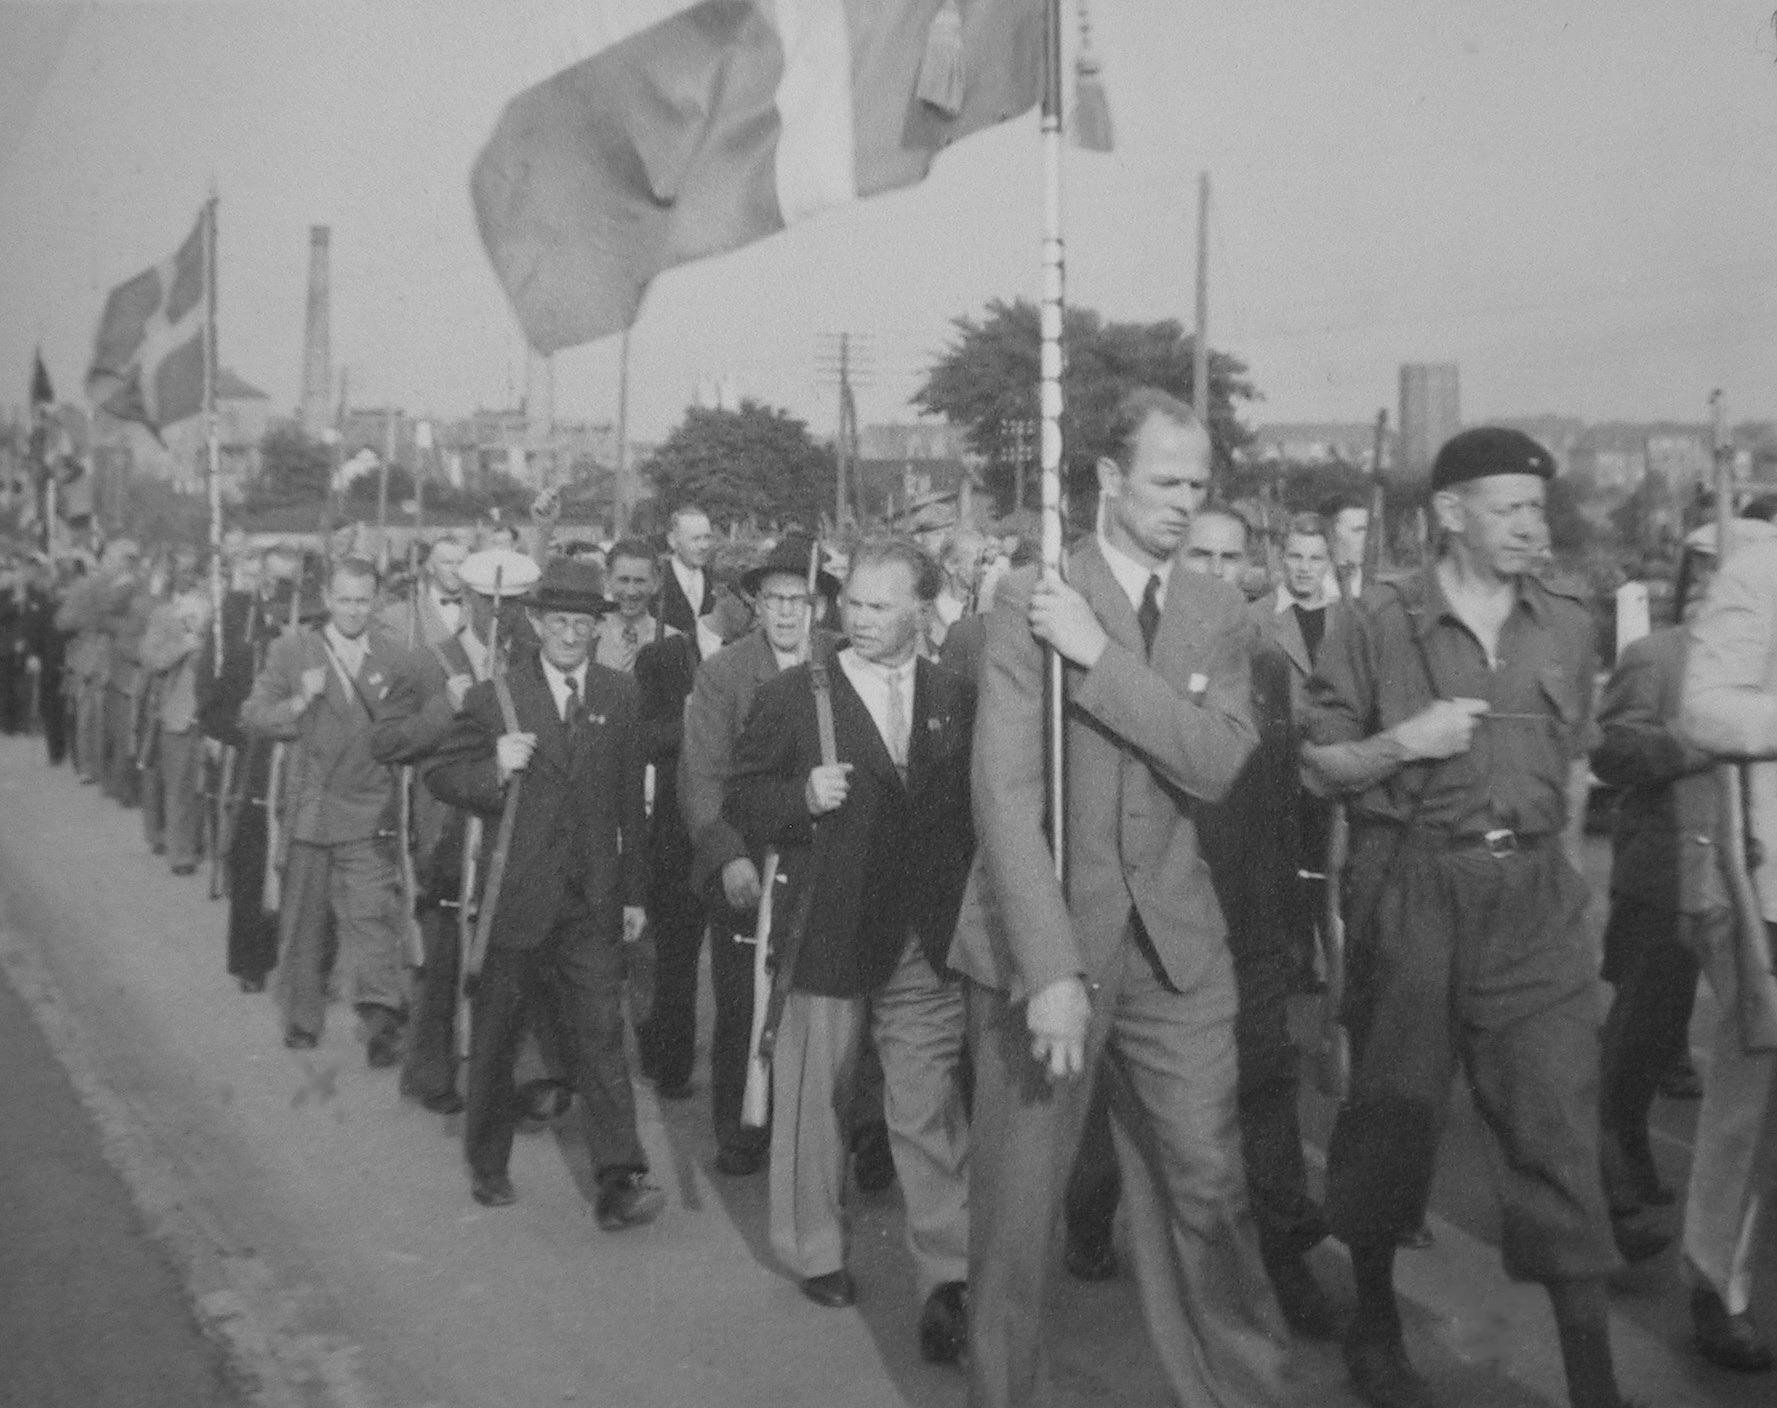 asf_1946_valdemarsdag